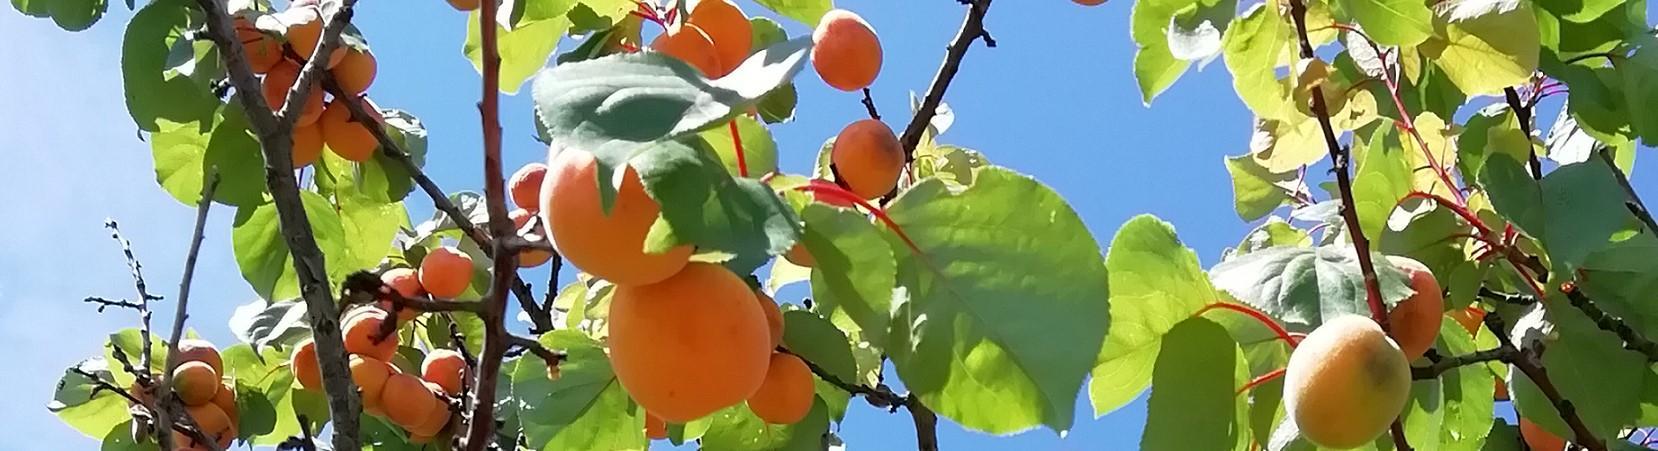 Bandeau abricot uz 1